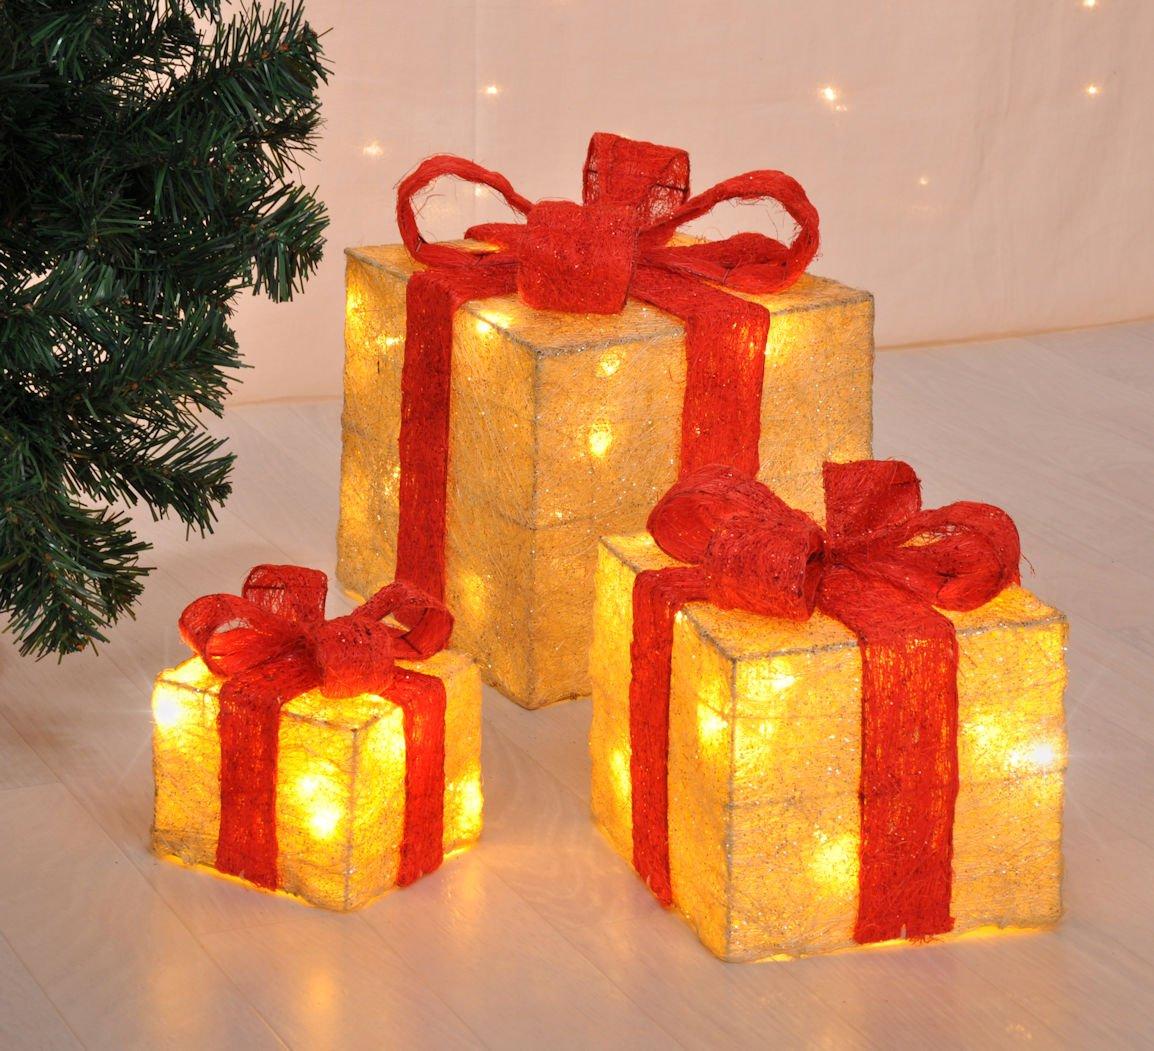 LED Deko Geschenk Boxen - 3er Set inkl. Timer Funktion - Weihnachts Dekoration Weihnachtsdeko Geschenke Spetebo